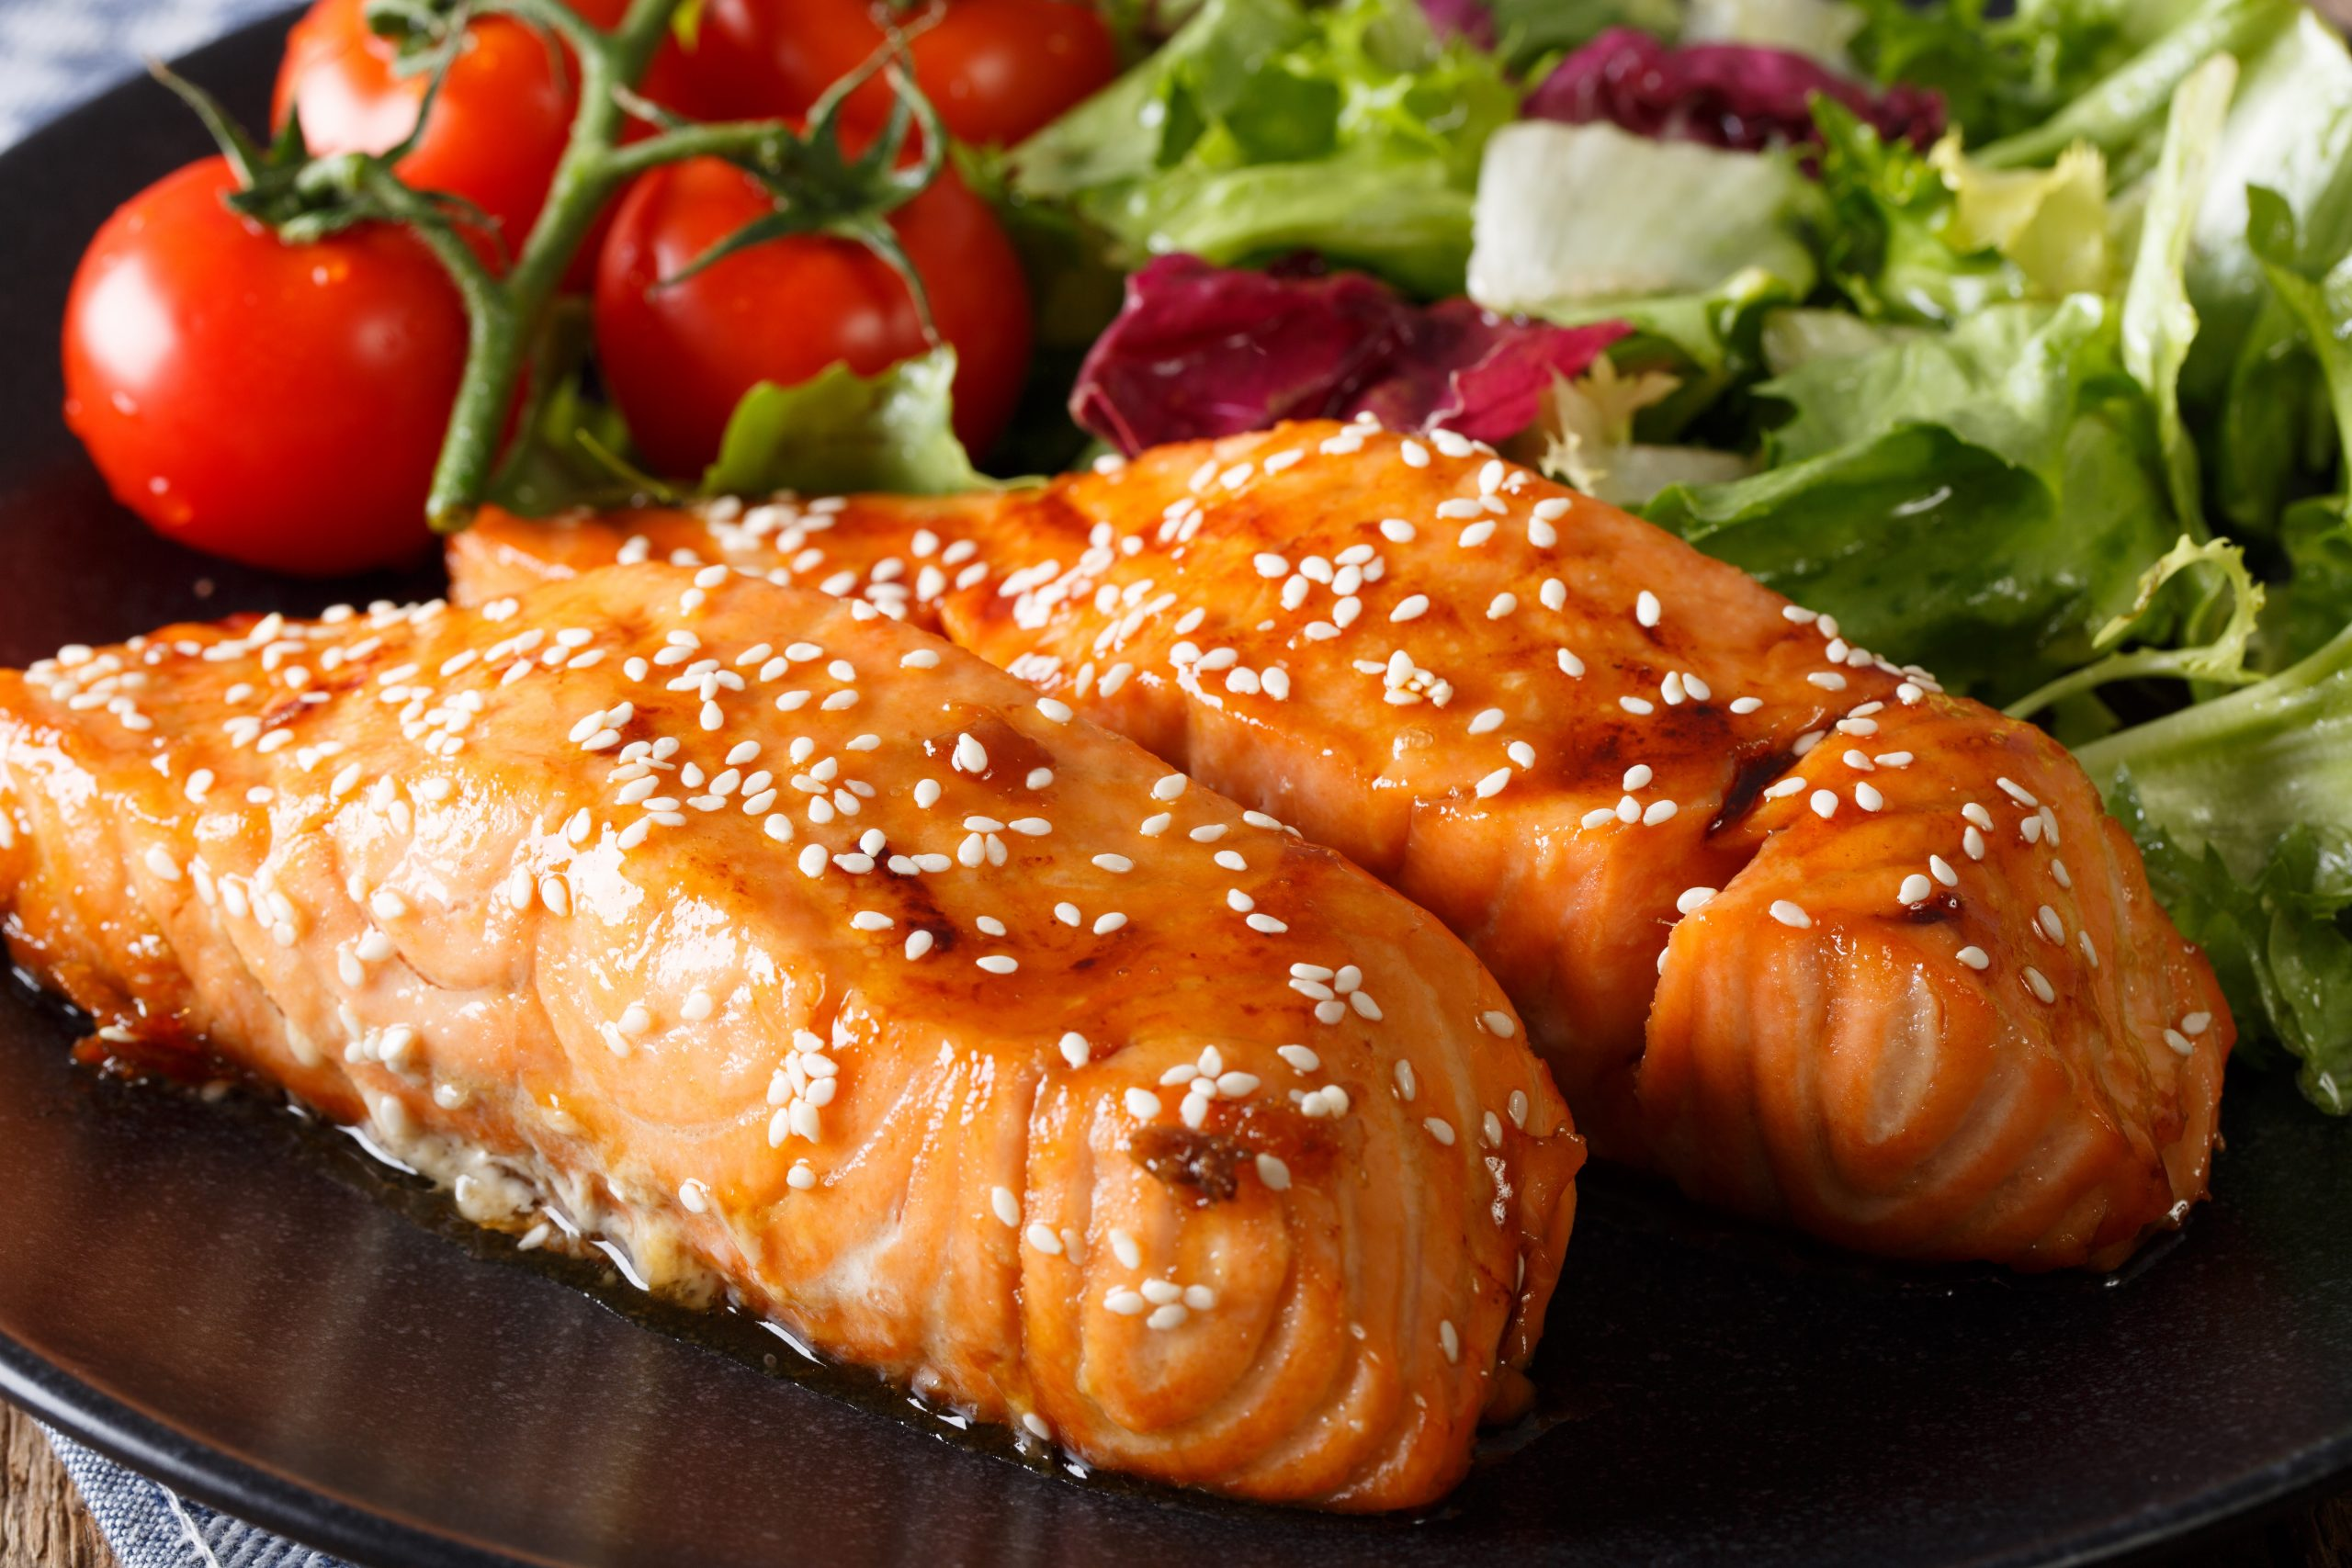 Glazed salmon fillet with sesame close-up. horizontal